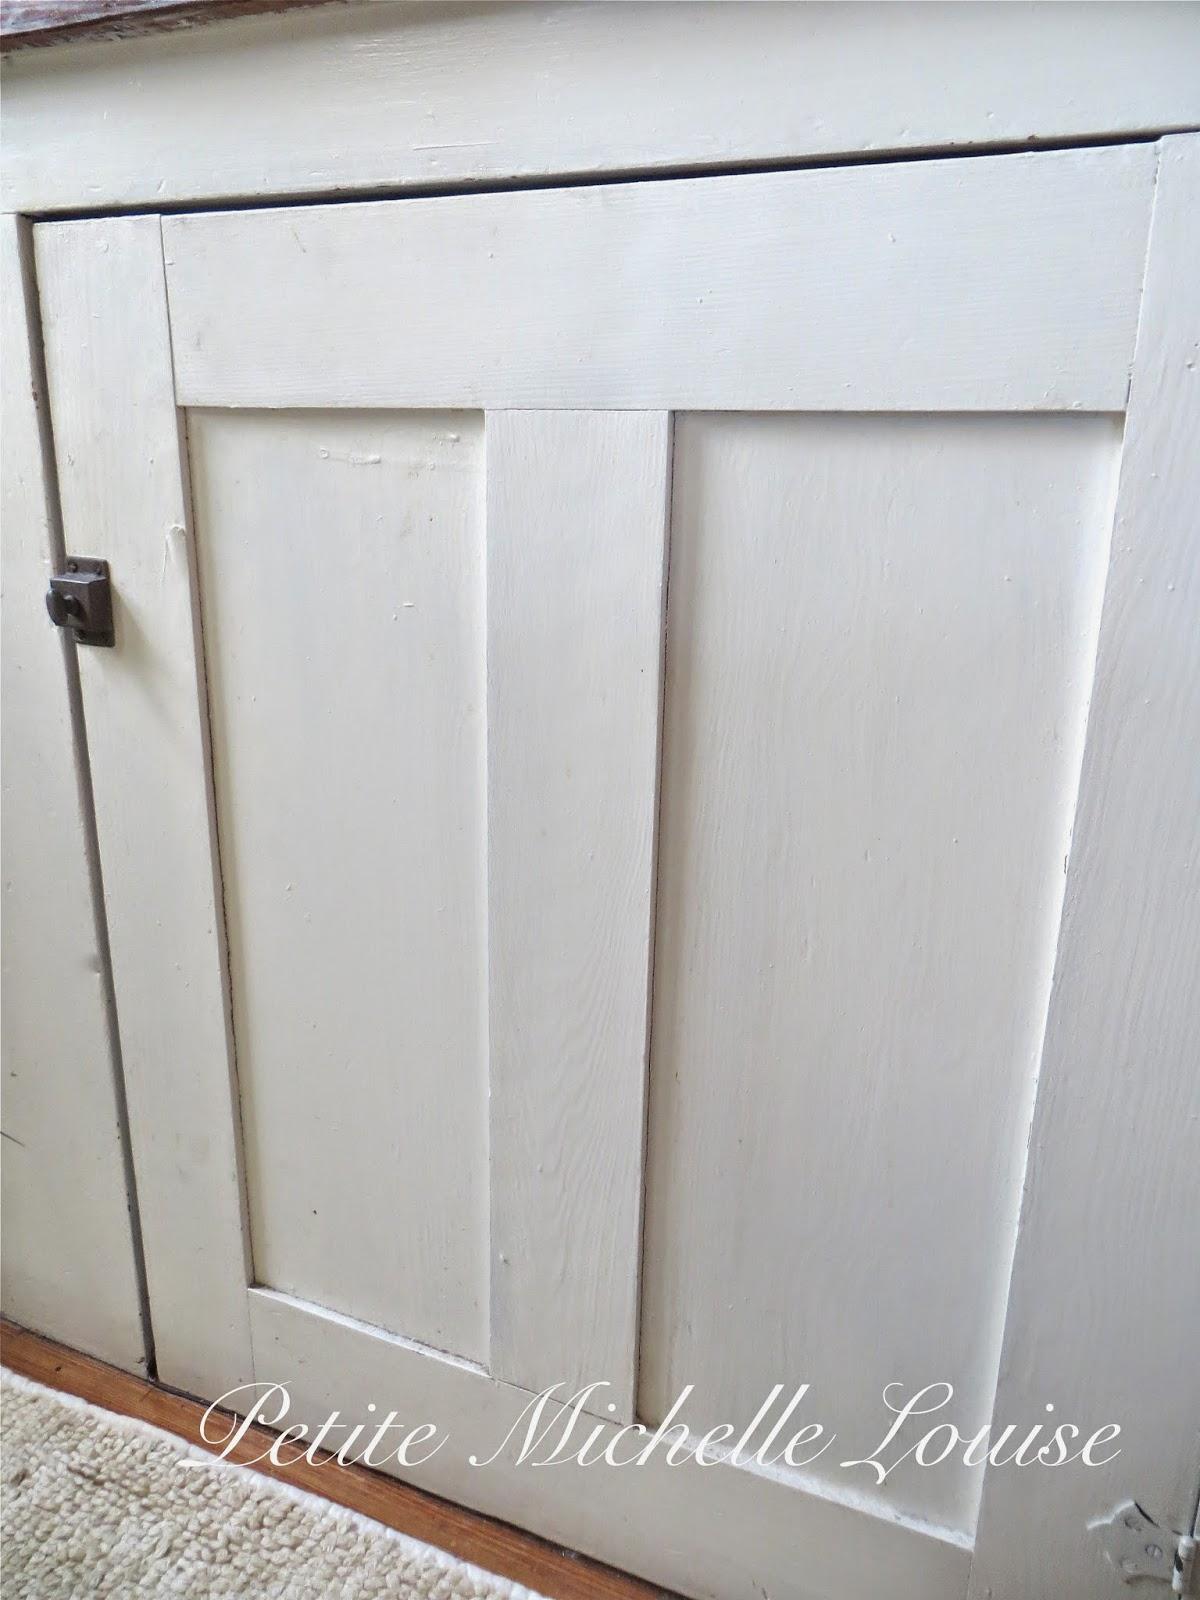 Petite Michelle Louise DIY Cabinet Door Facelift 1200x1600